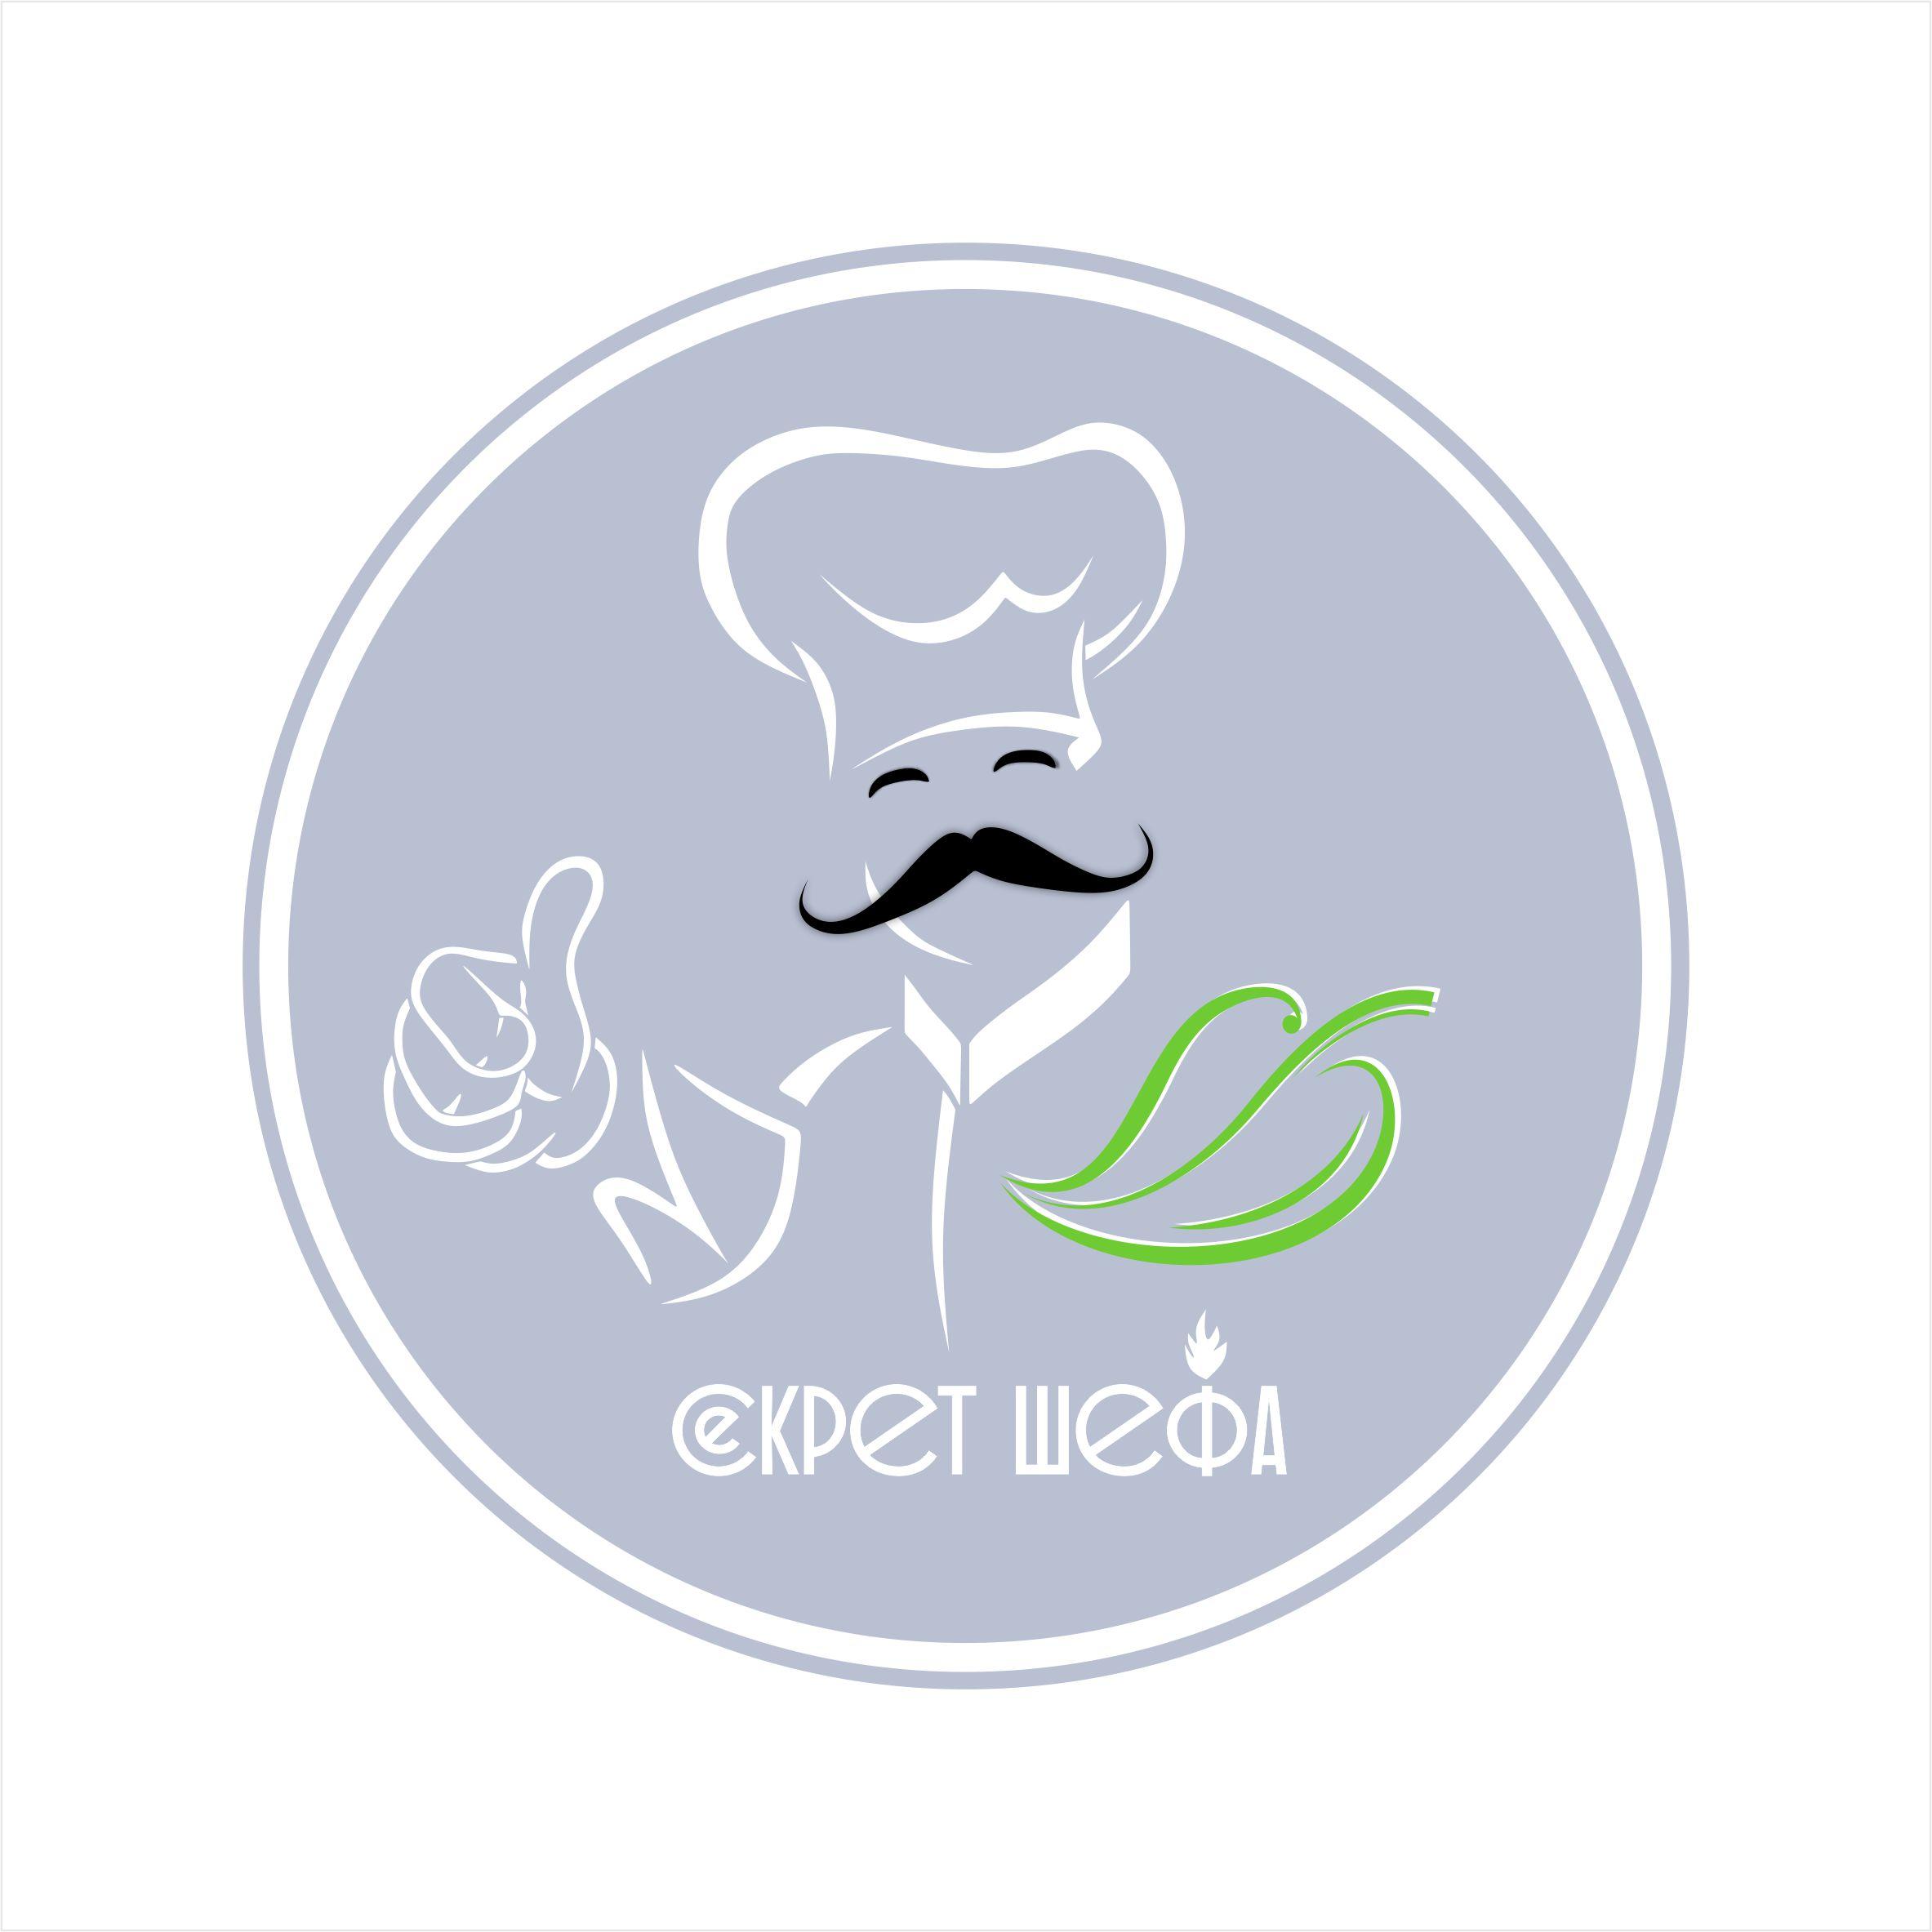 Логотип для марки специй и приправ Секрет Шефа фото f_2795f3fd907dcf36.jpg